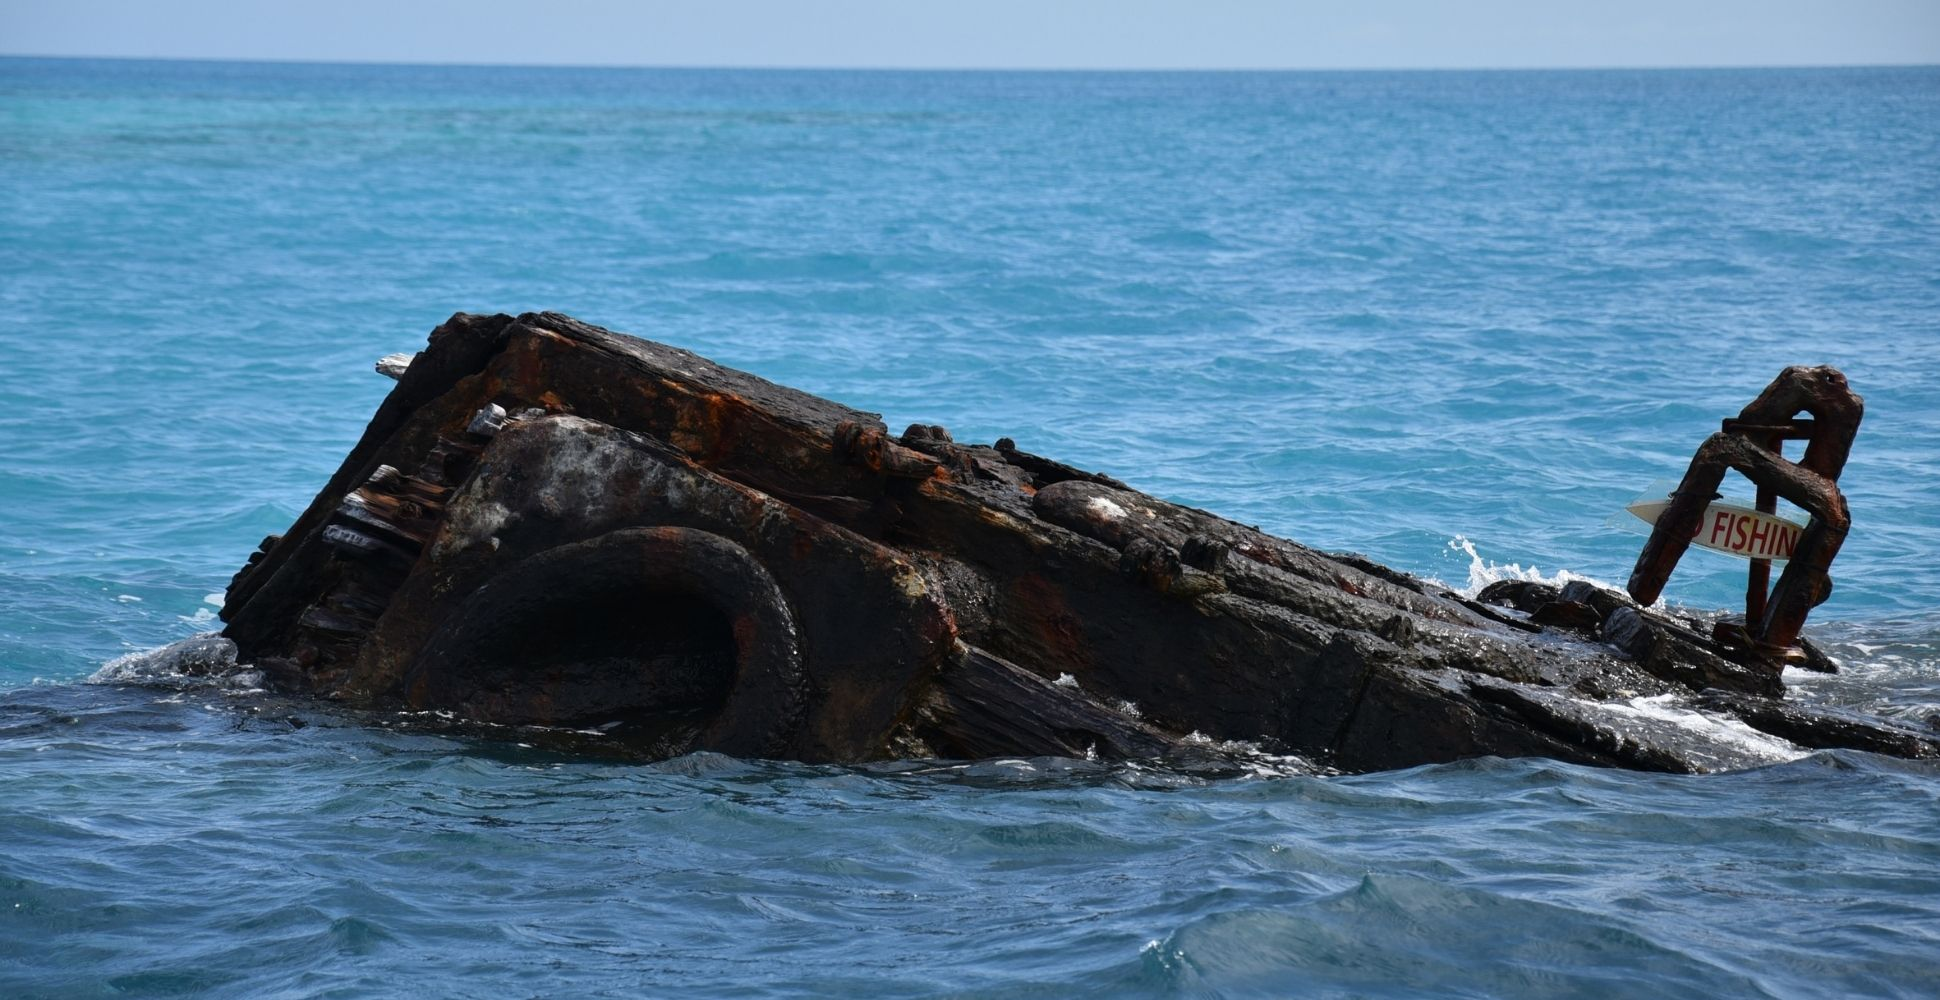 bermuda-triangle-shipwreck